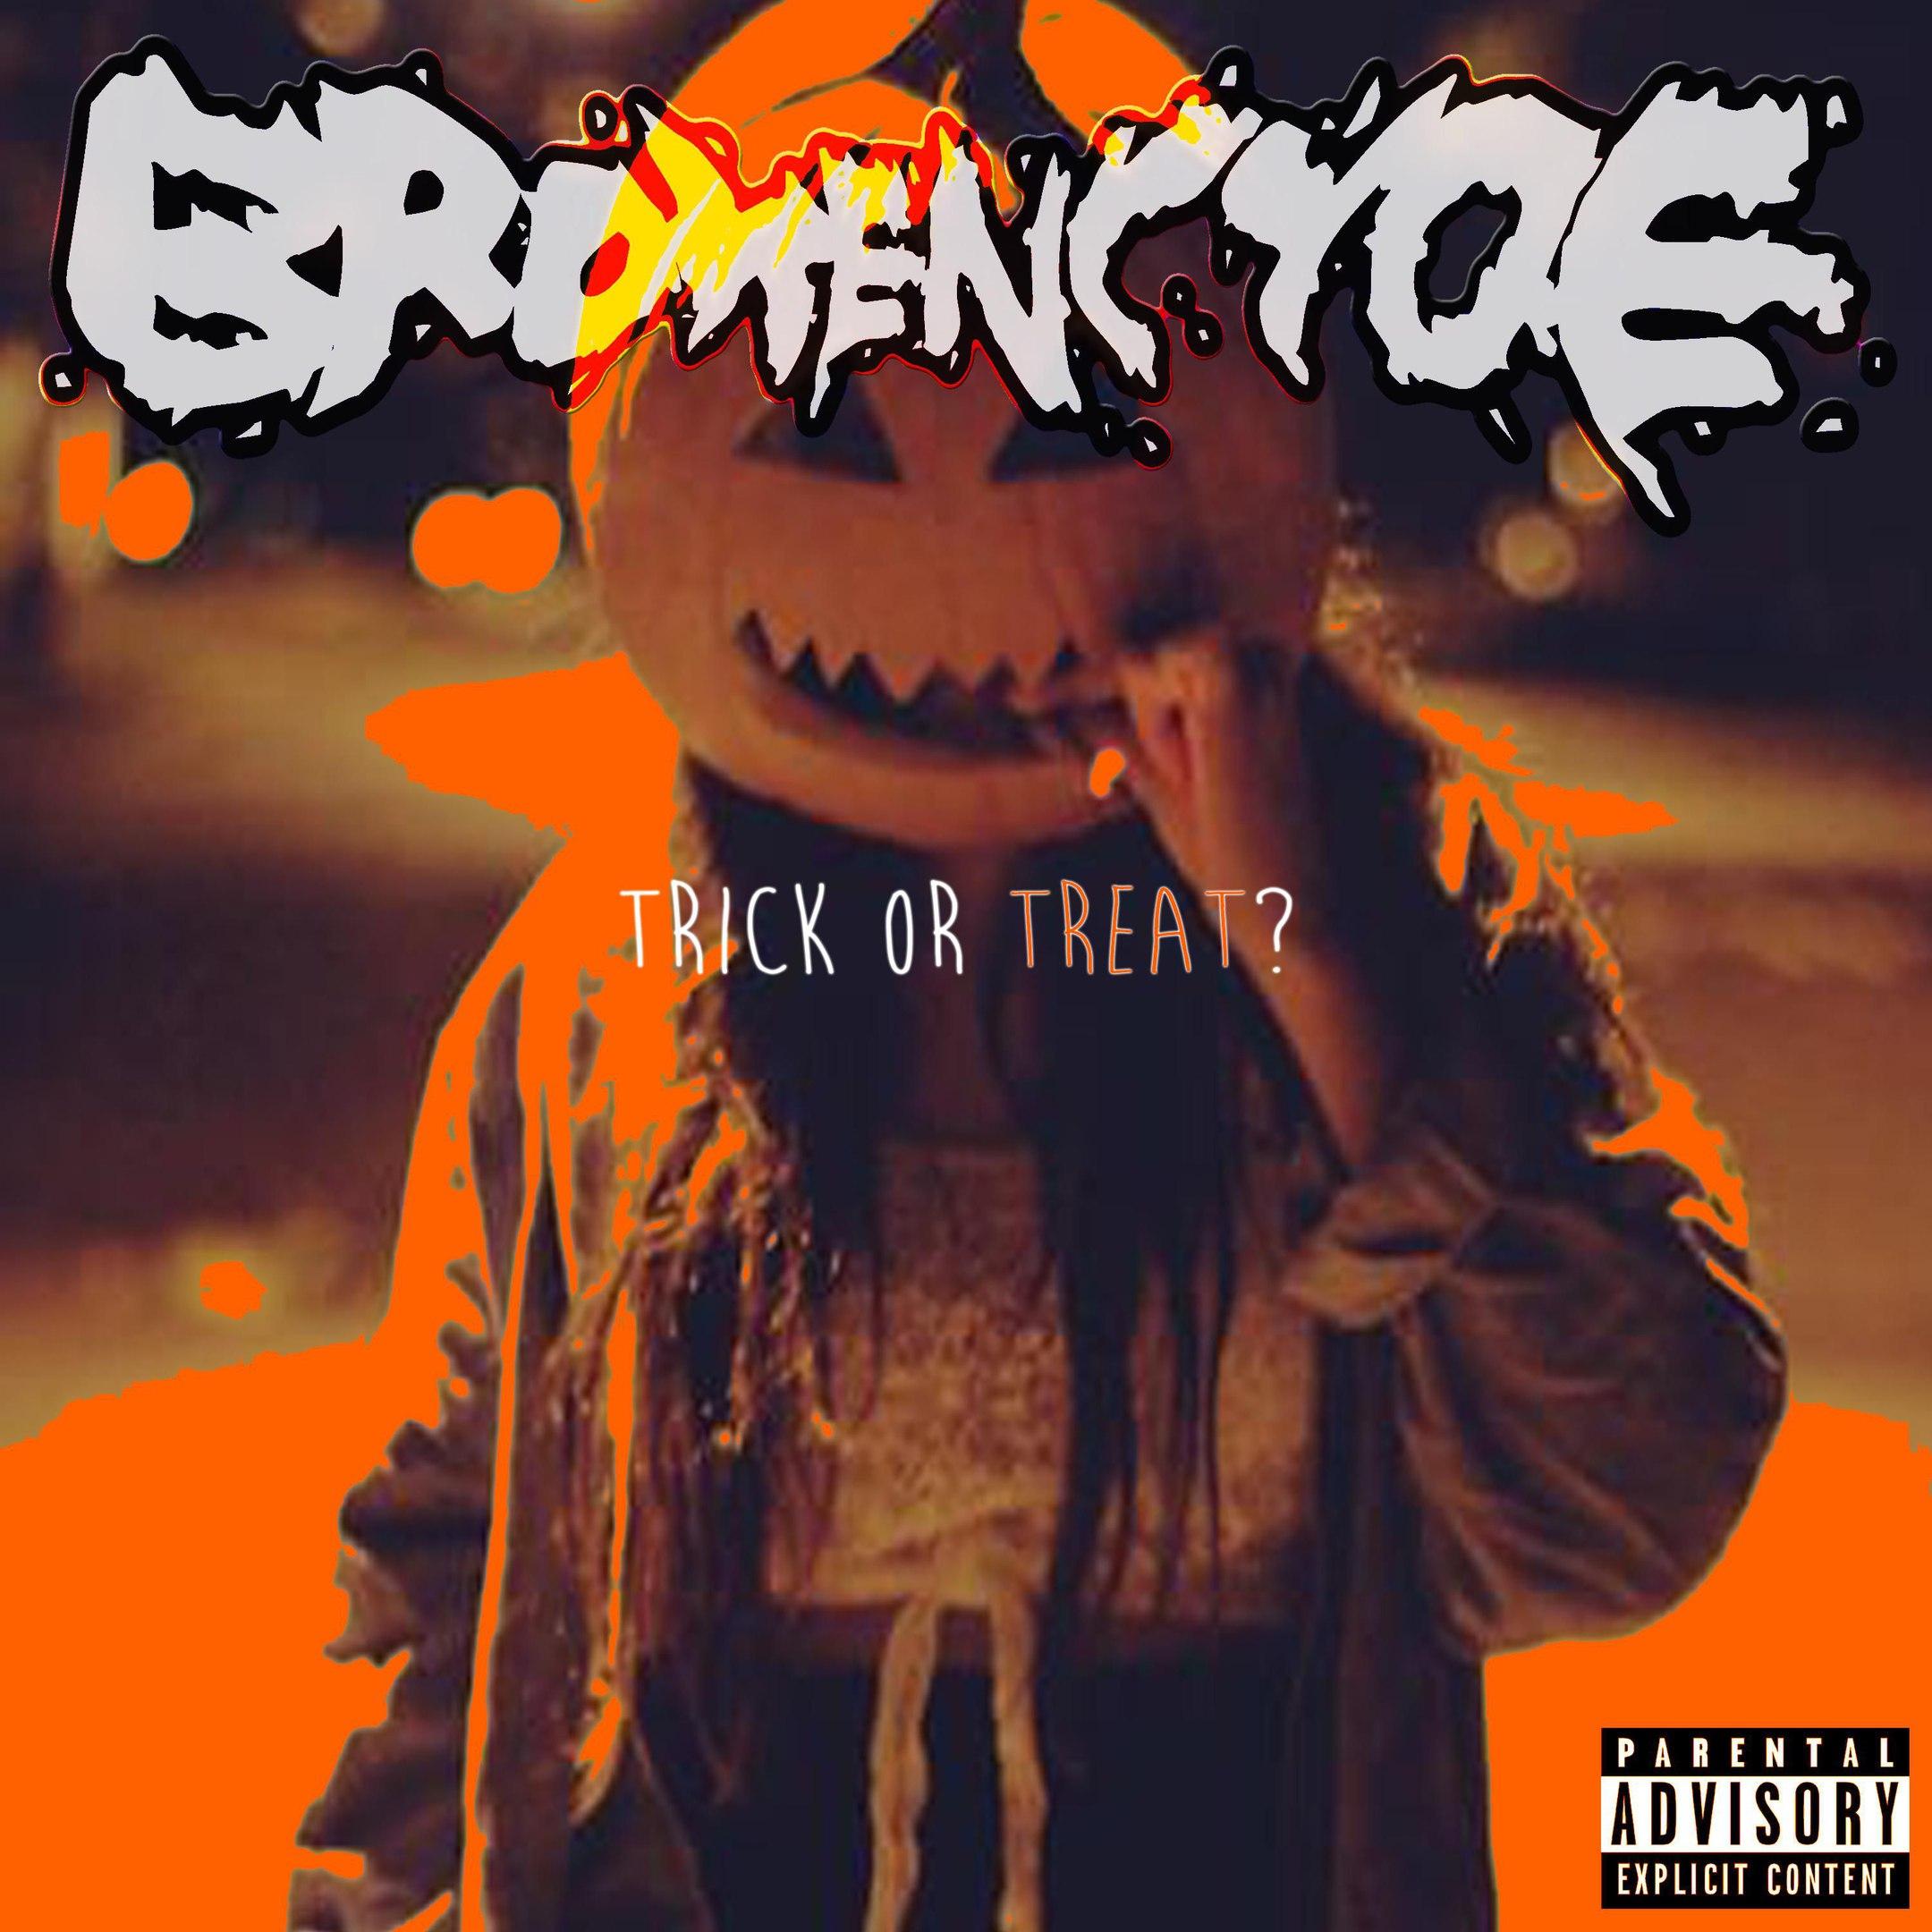 brokenNYDE - Trick or Treat? [single] (2015)